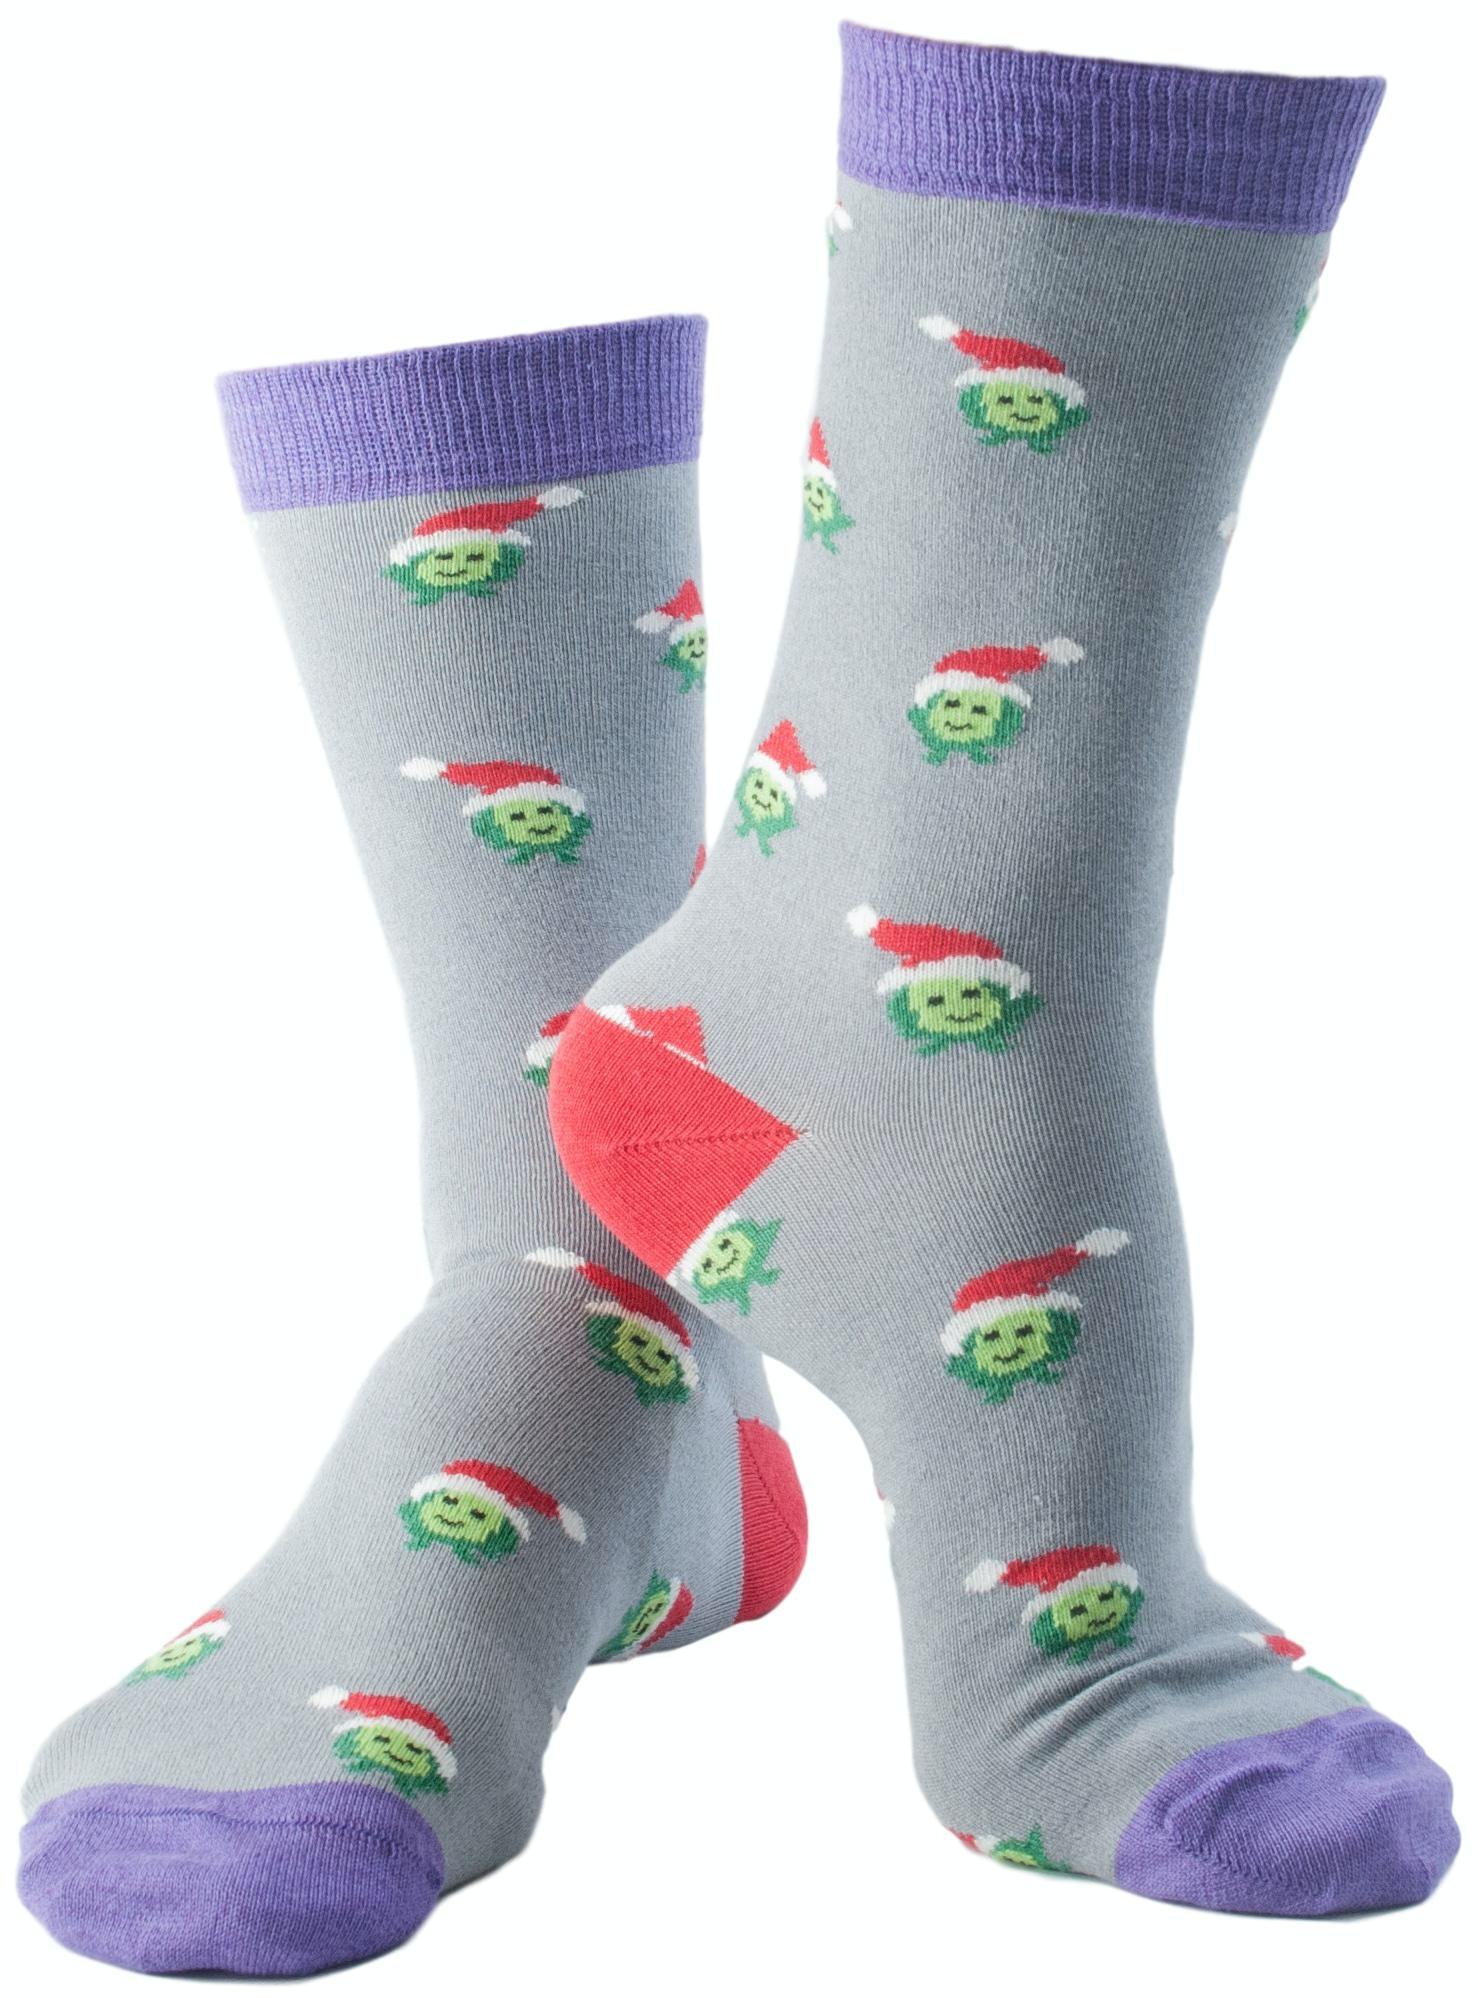 Doris & Dude Sprouts Socks